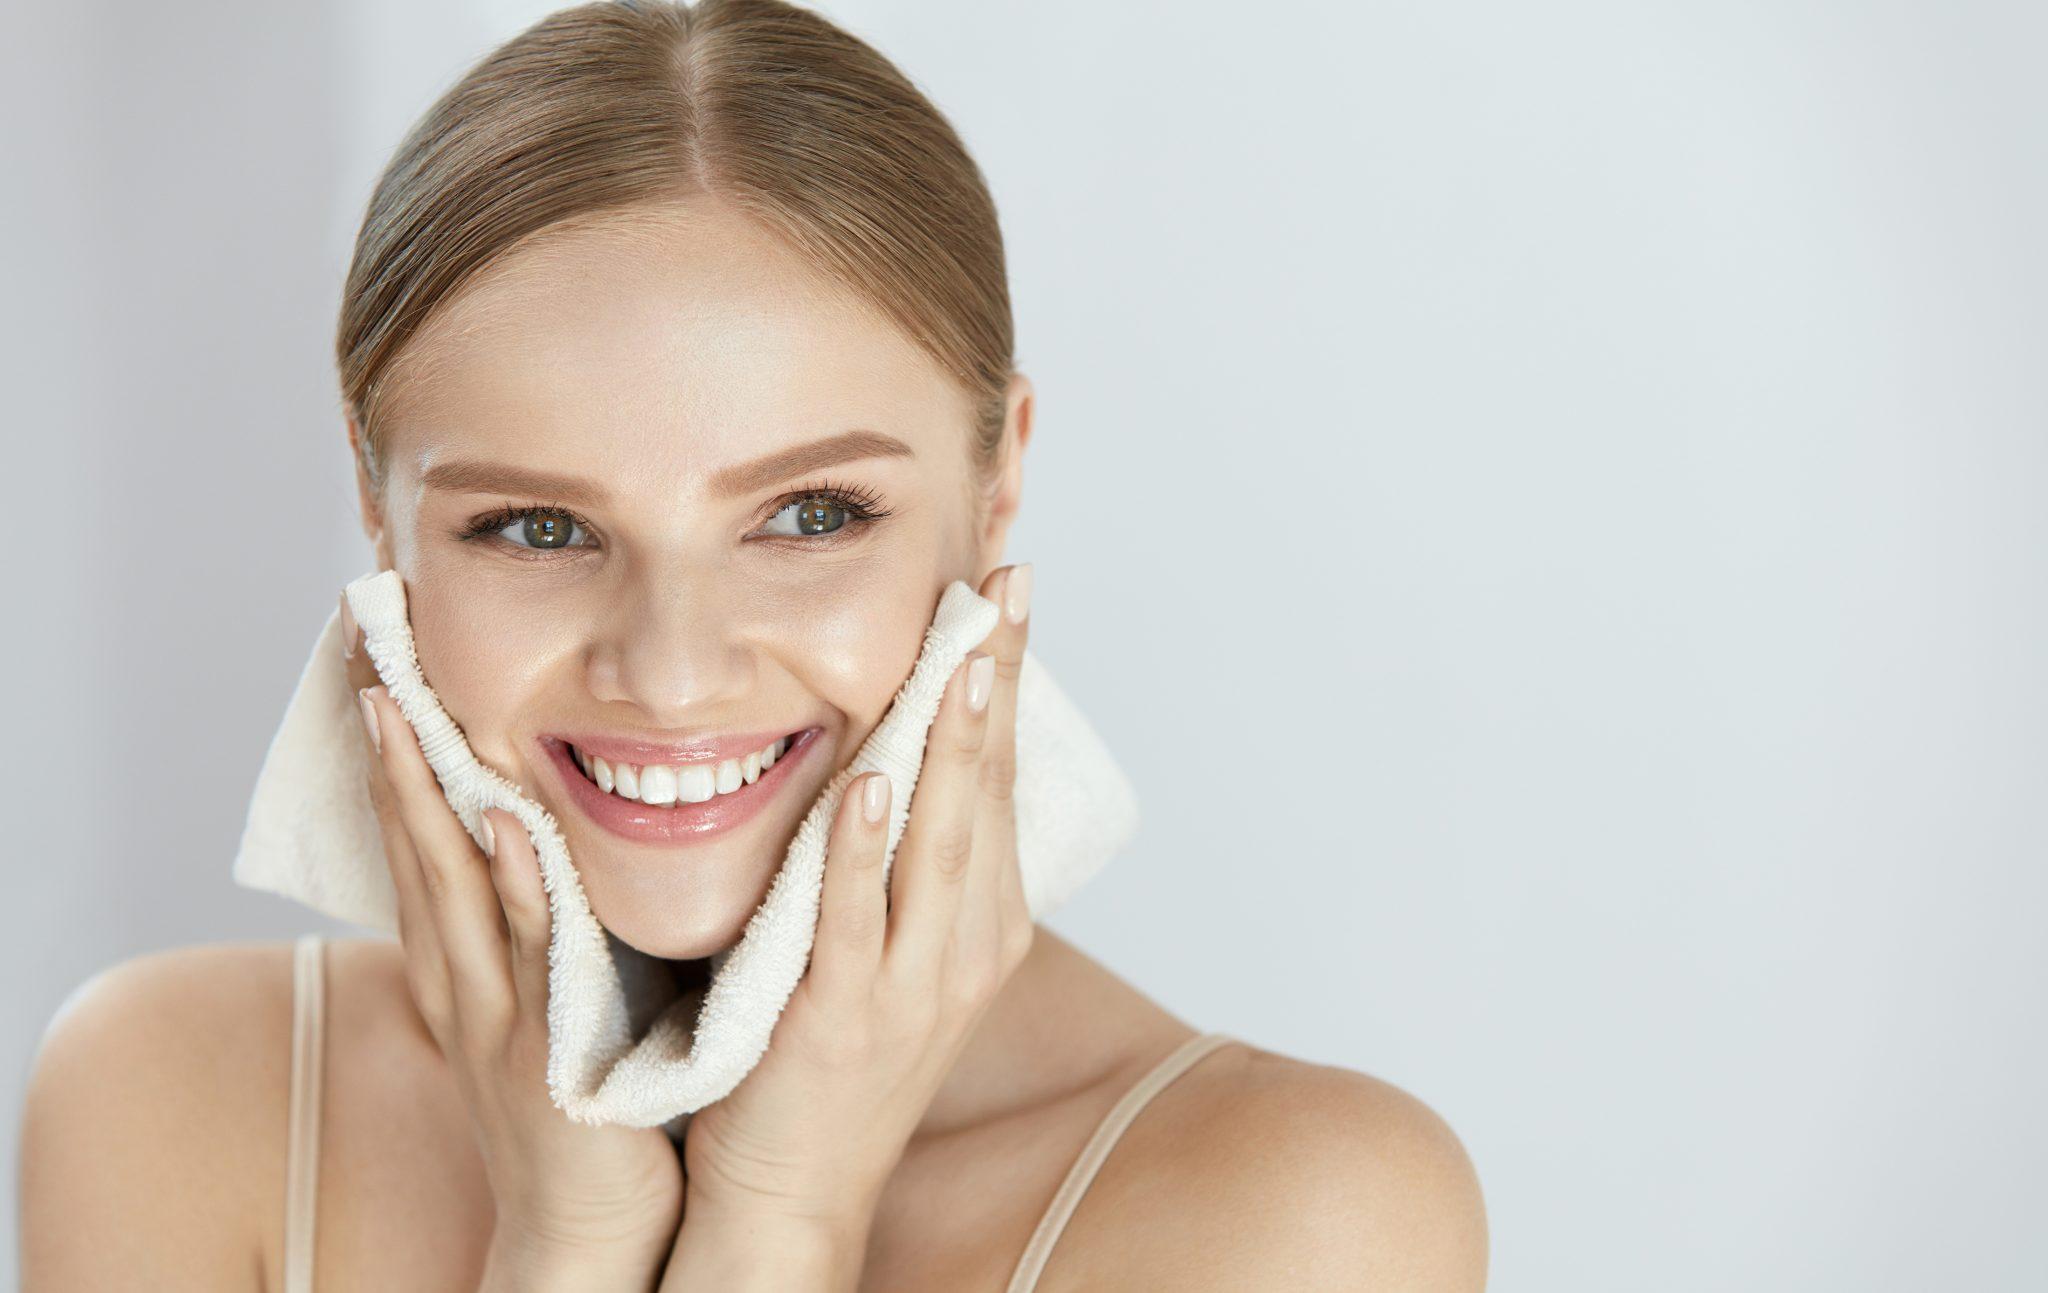 Skin Prescriptions • Skin Consultation • Organic, Natural, Paraben-Free Ingredients • Vegan • Skin Problems • Skin Remedies